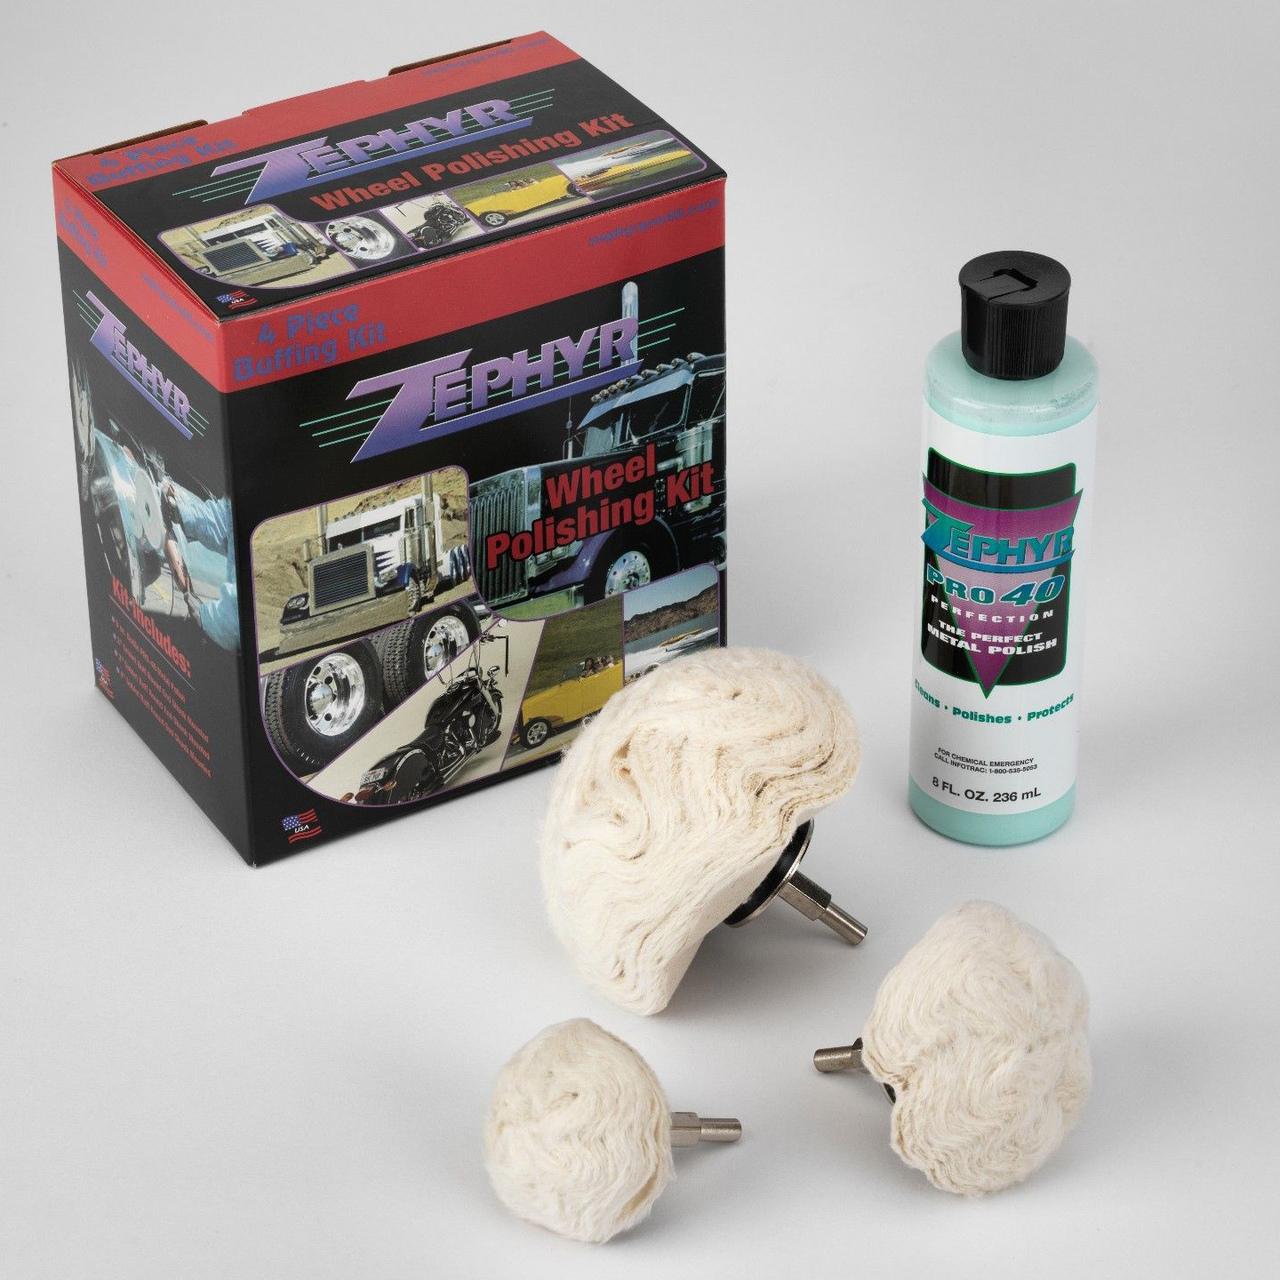 Zephyr (4 Piece) Wheel Polishing Kit